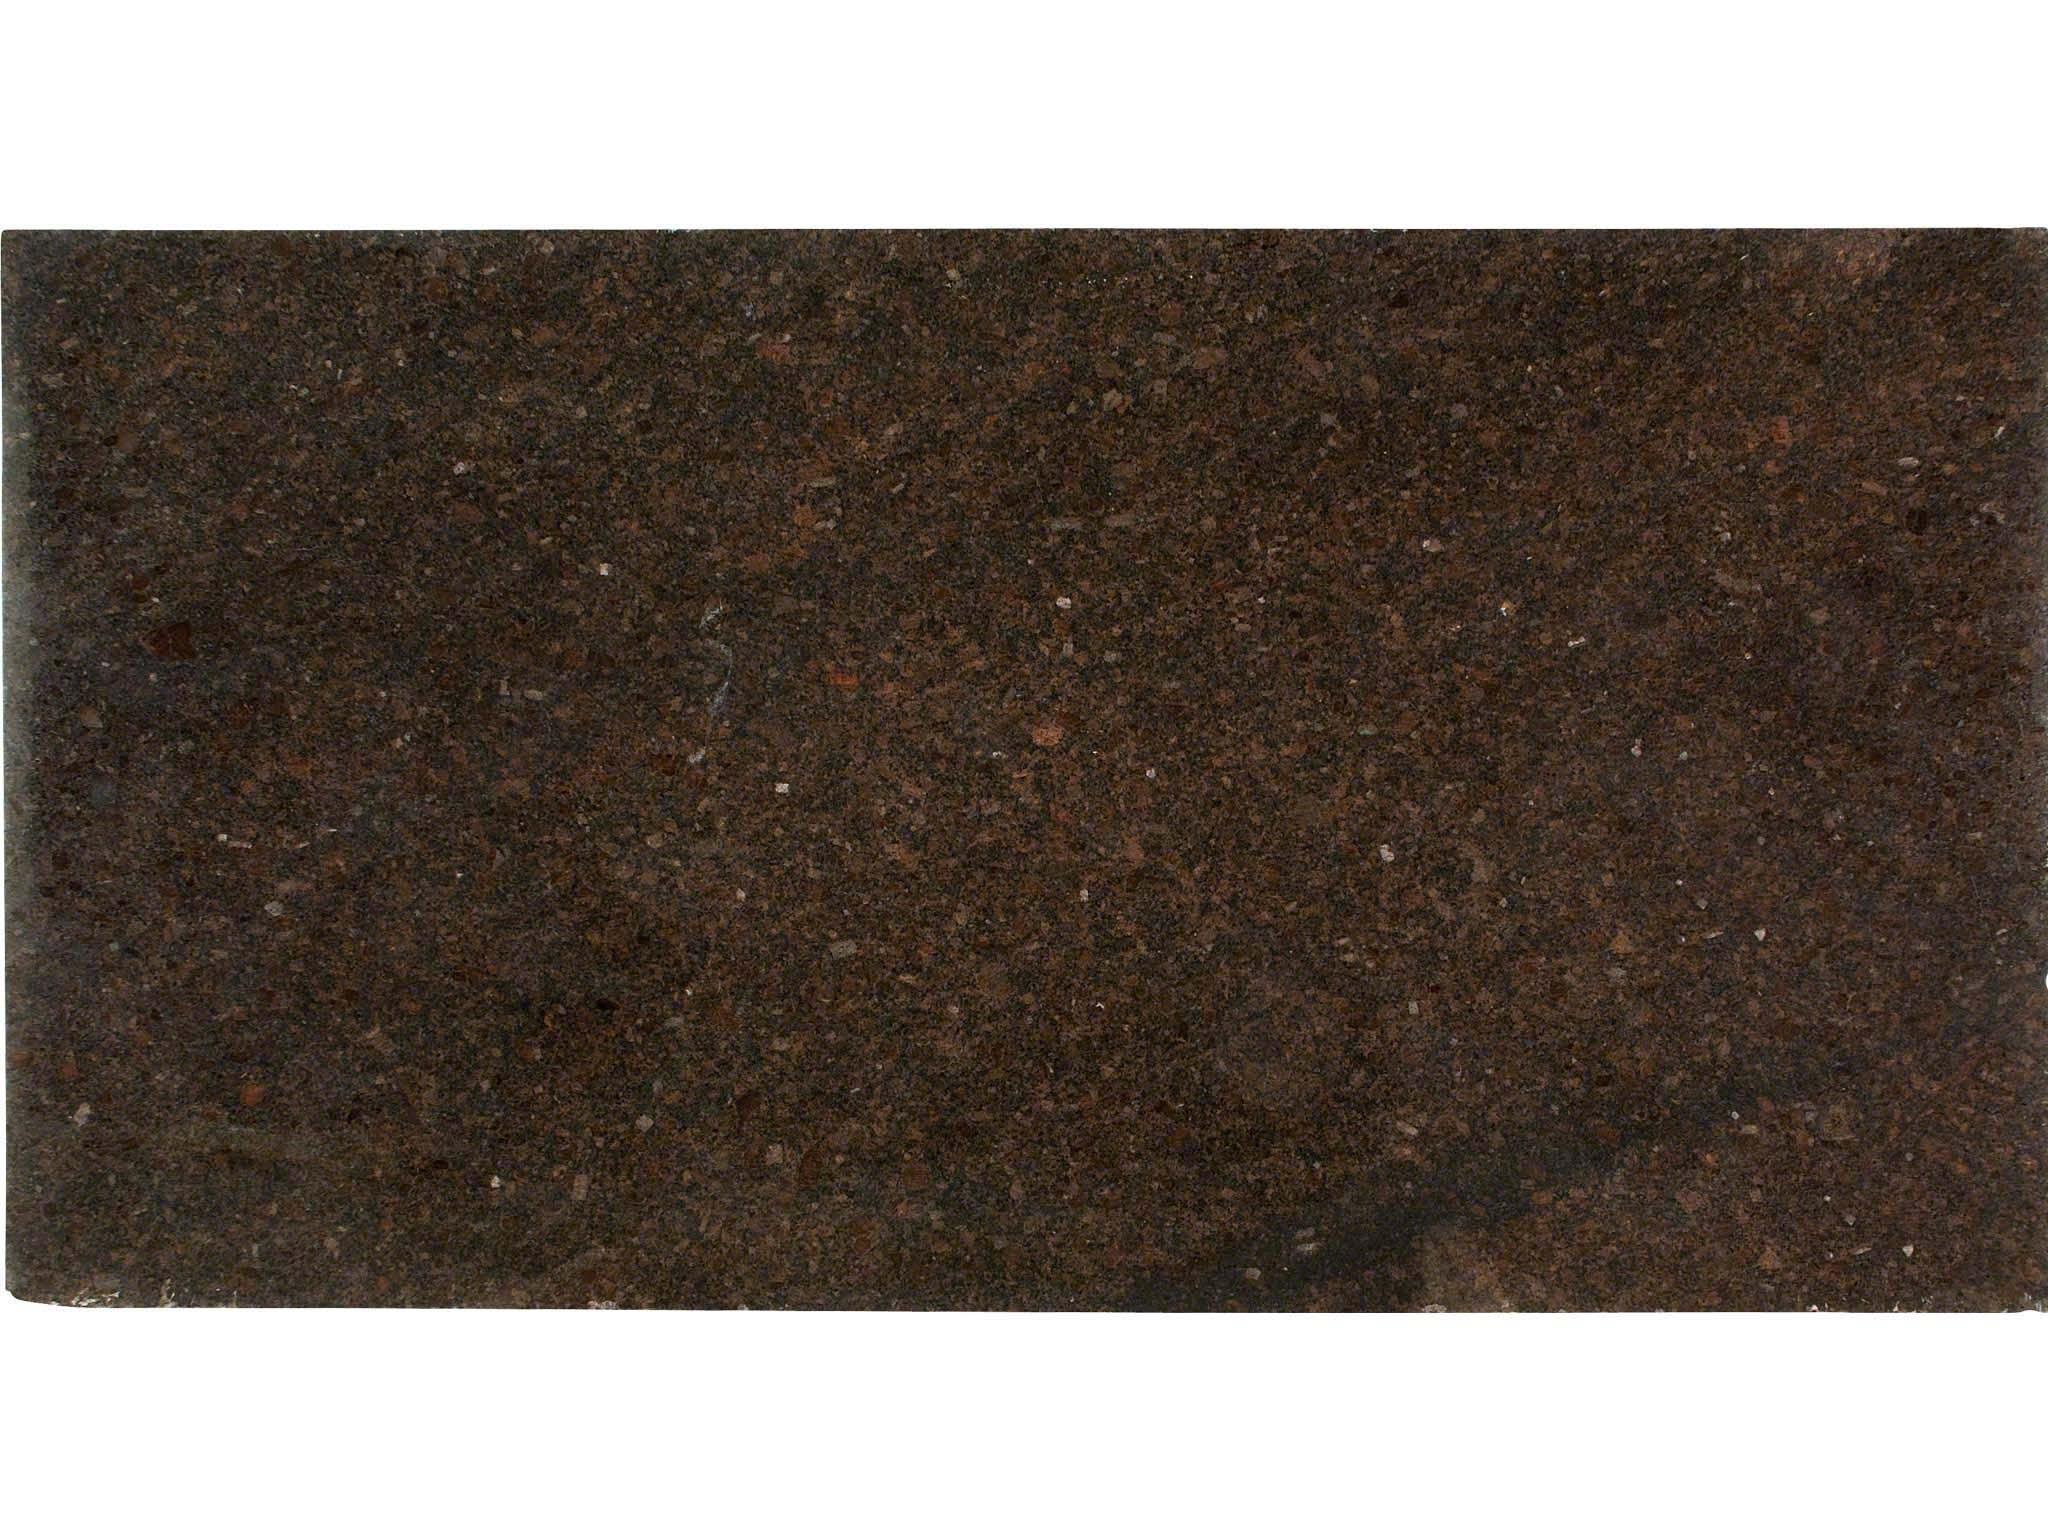 Coffee Brown Granite Accent Countertops